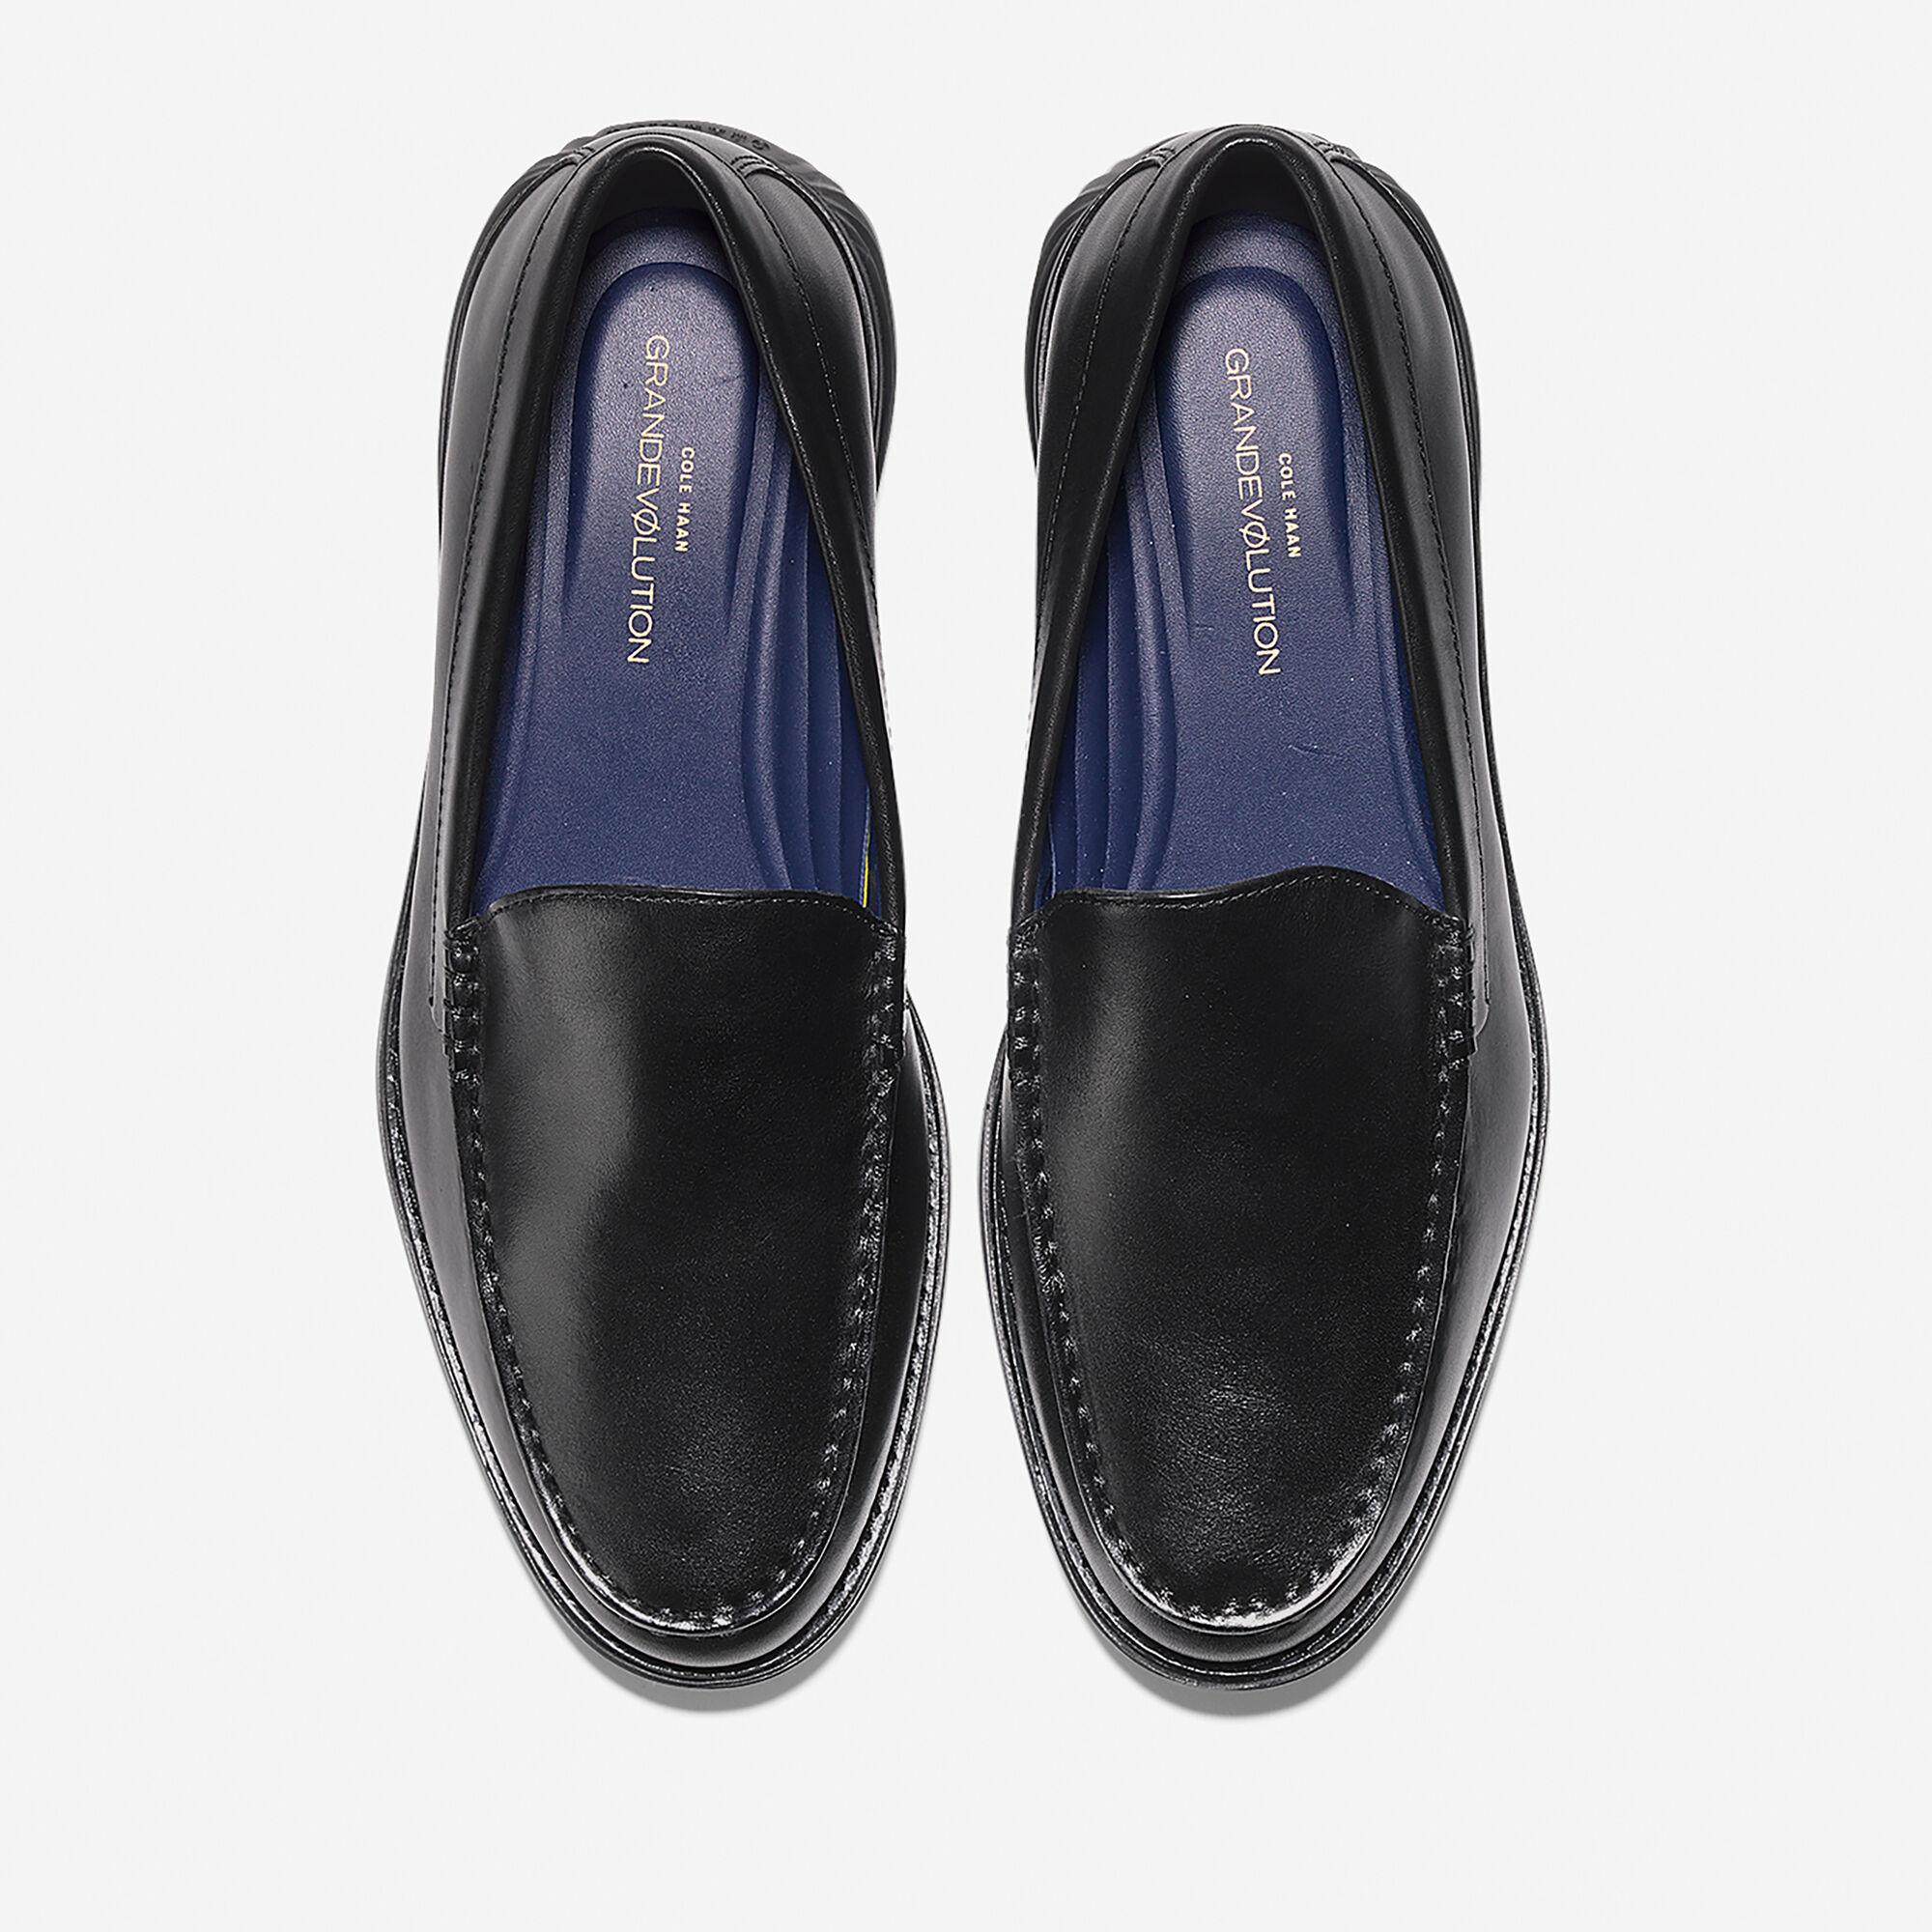 a5e4bfa1f17 Cole Haan Men s GrandEvølution Venetian Loafer in Black-black ...